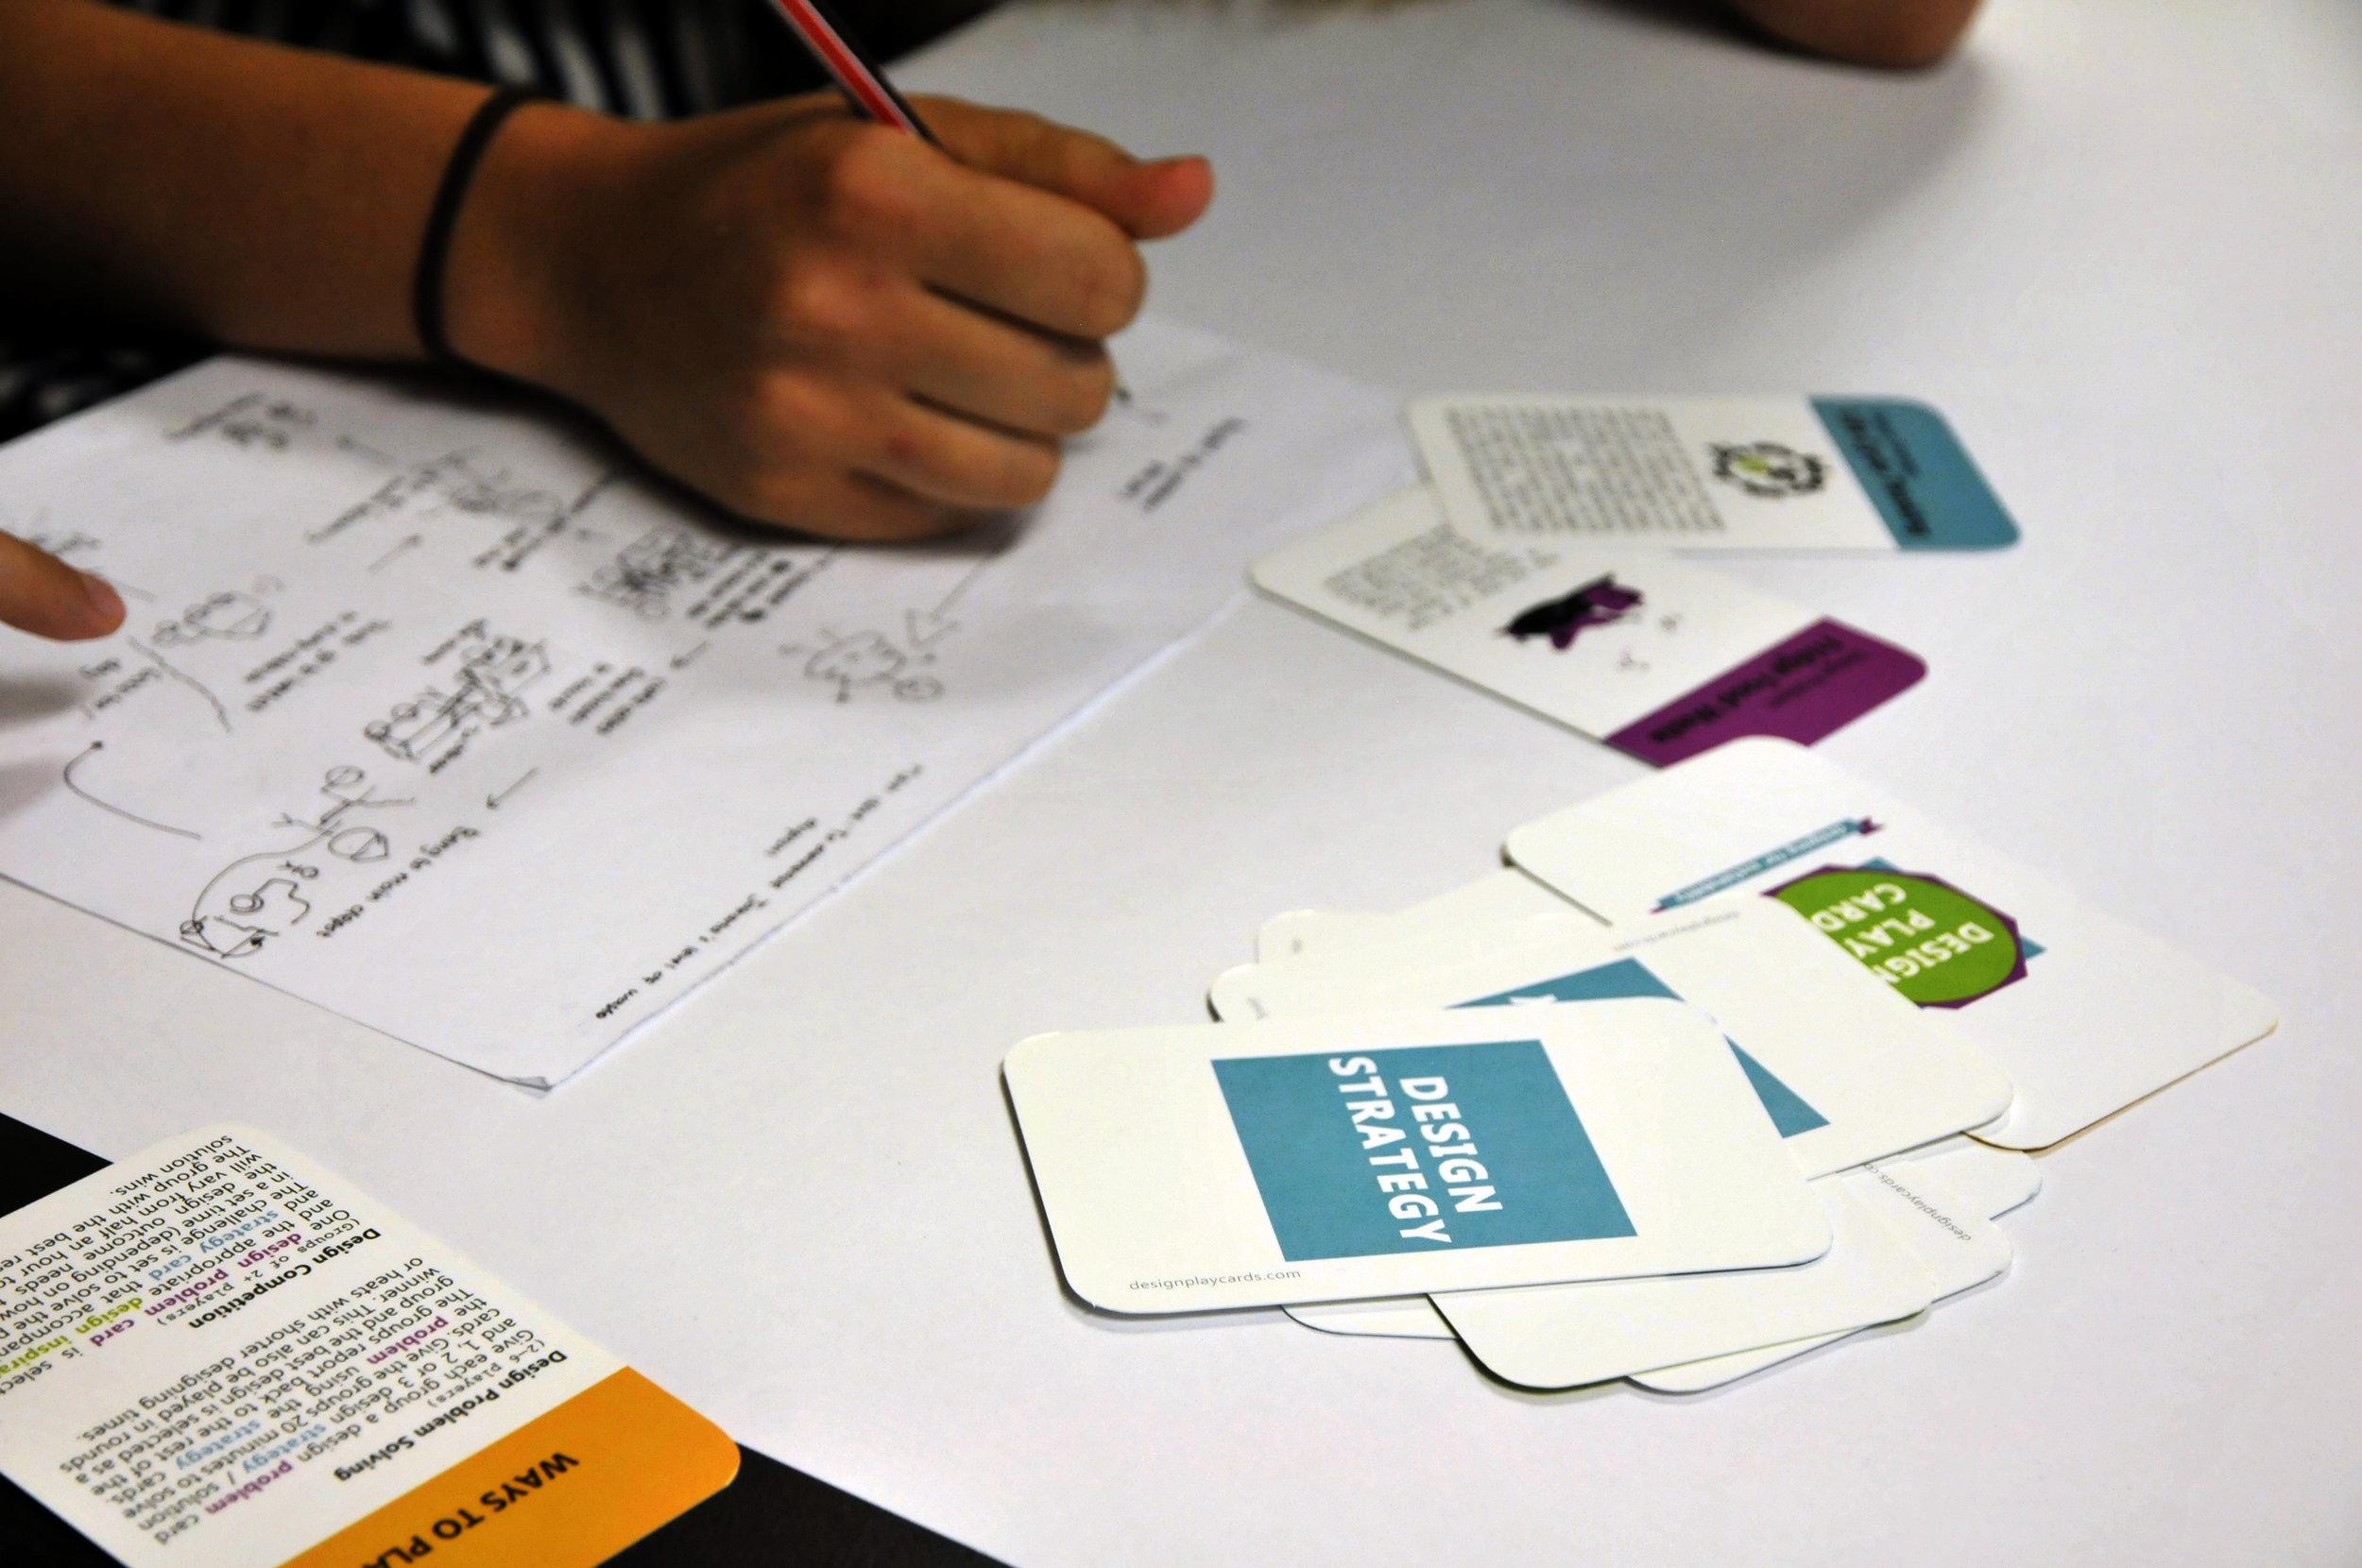 creative problem solving game through sustainable design by leyla acaroglu